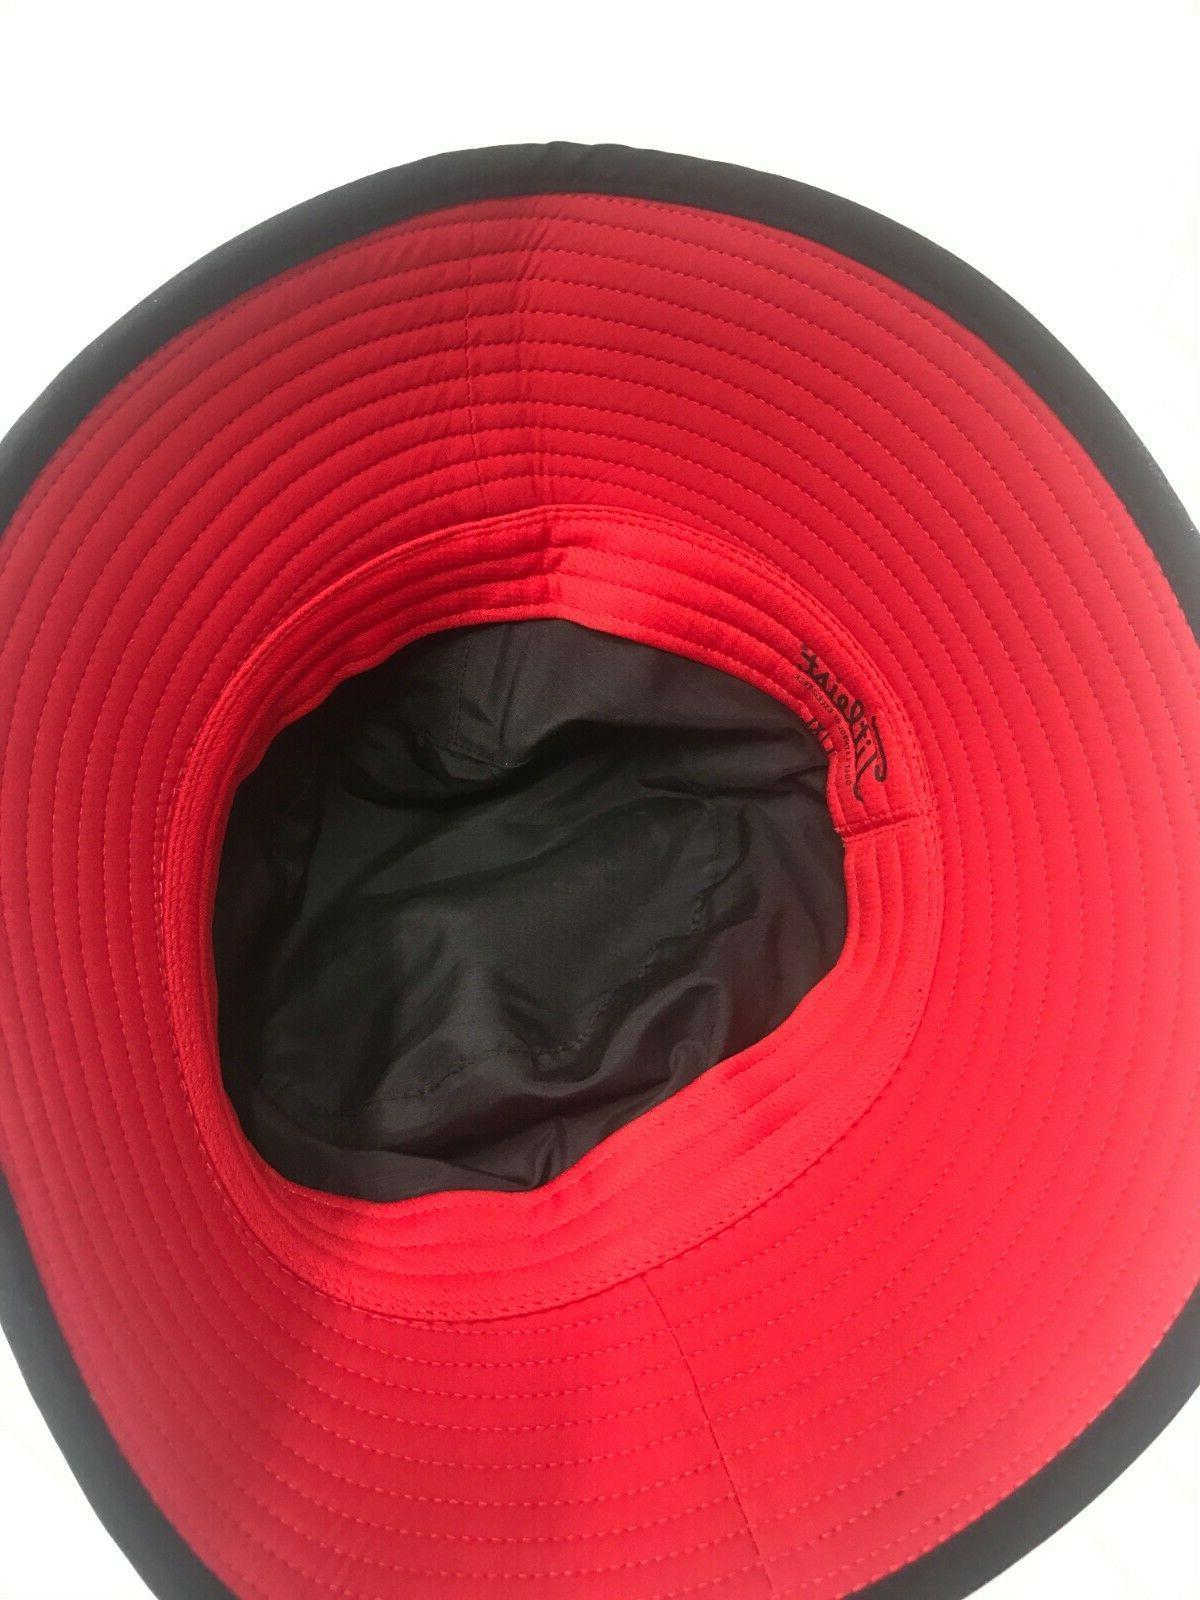 Titleist StaDry Hat Black Red - Pick Size